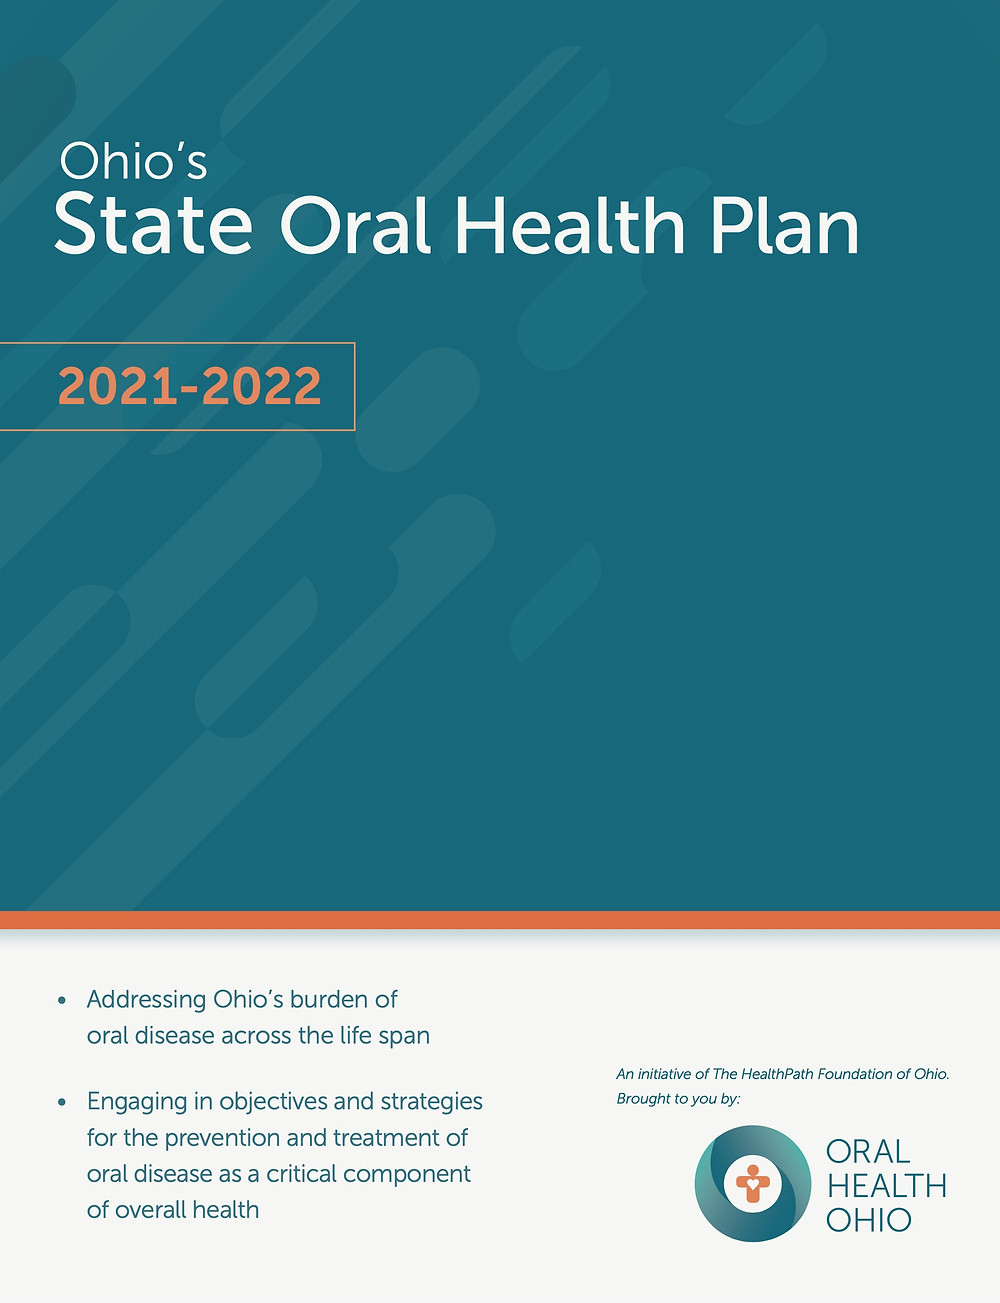 Ohio's State Oral Health Plan, 2021-2022